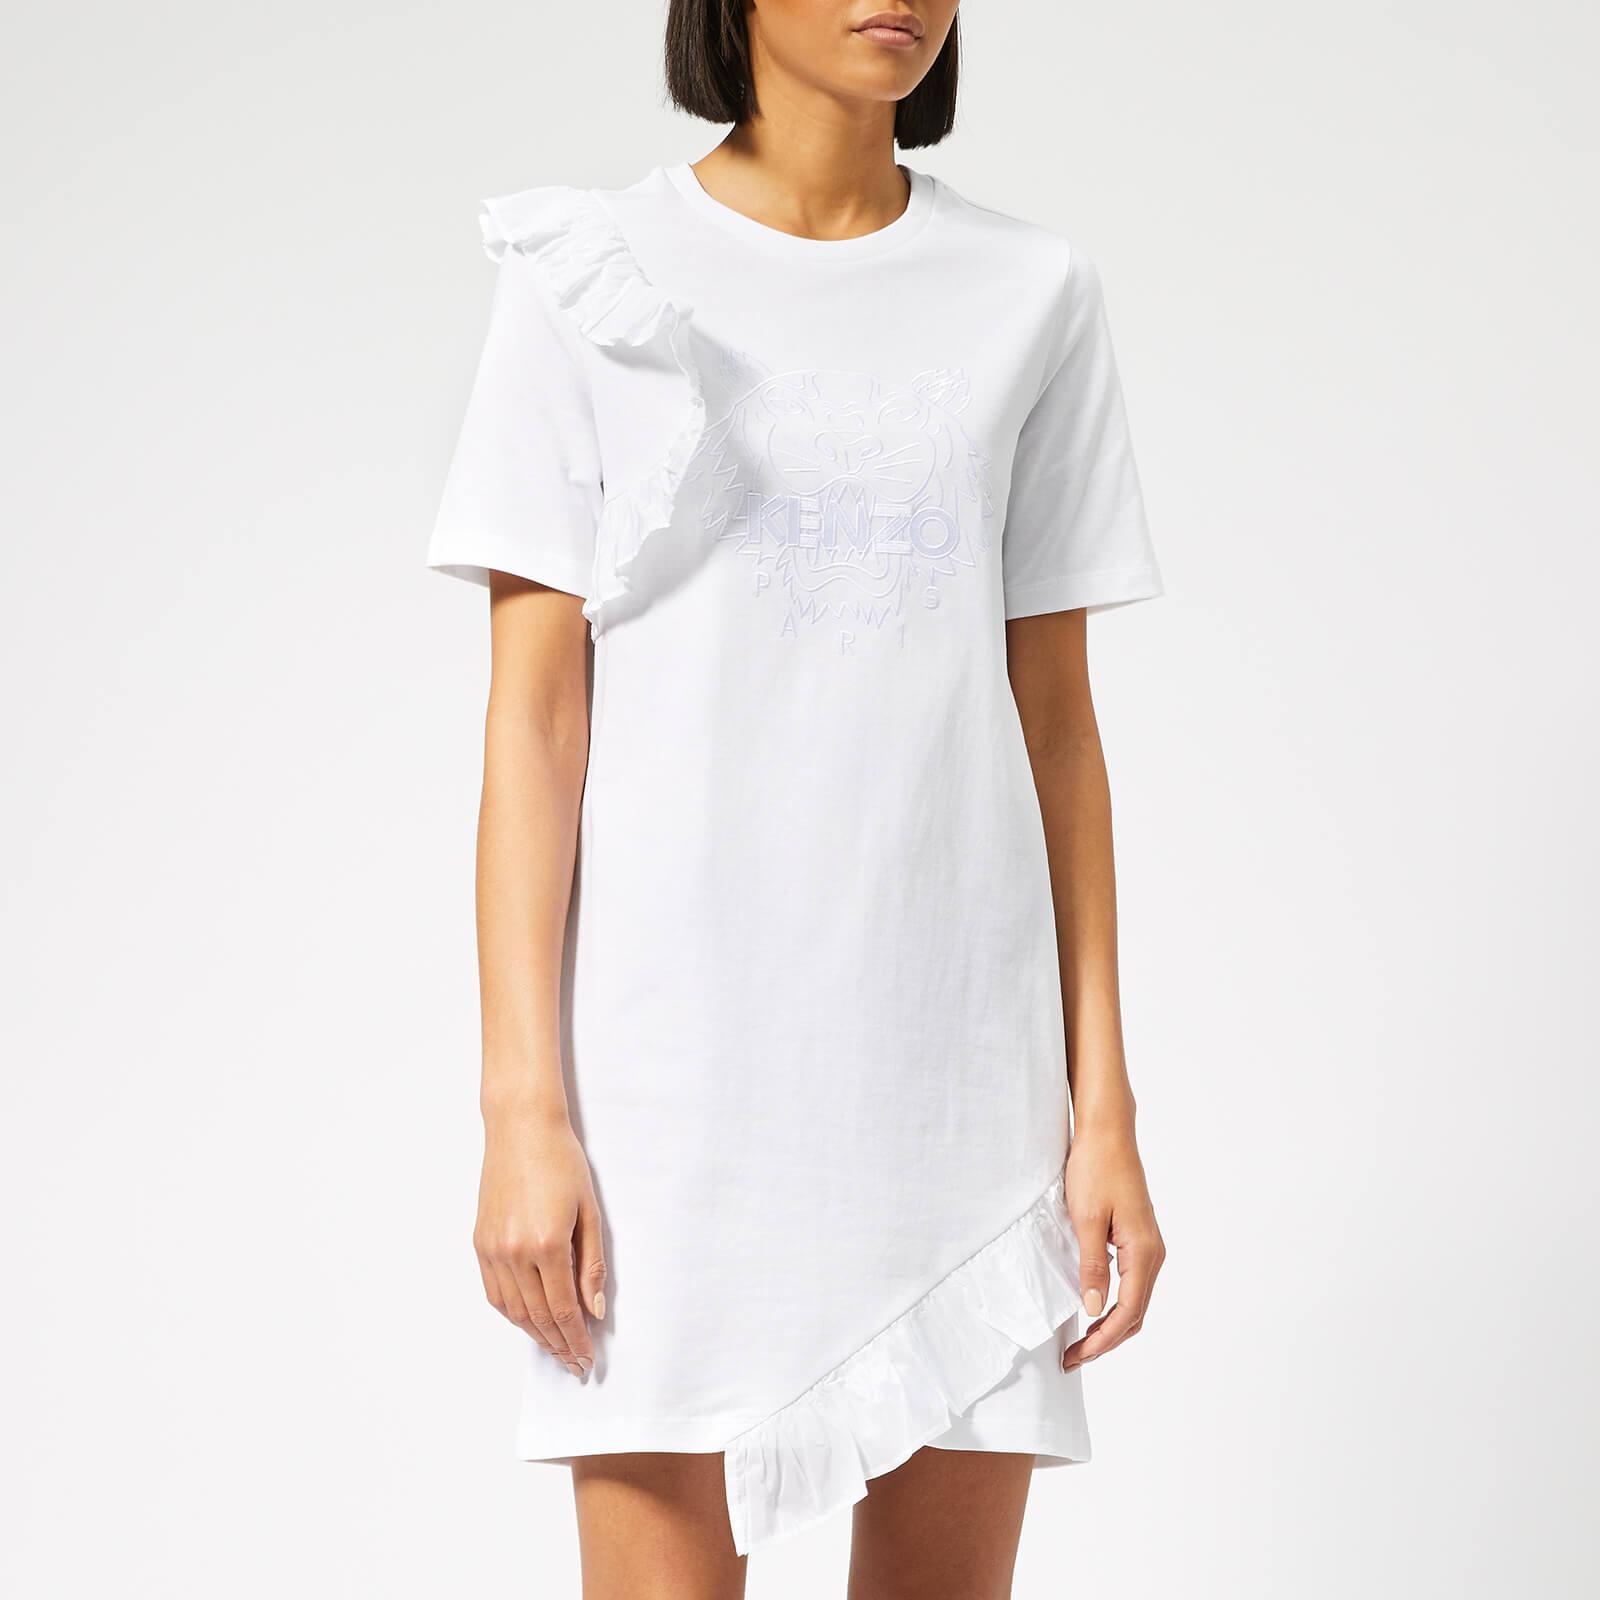 813f0fb75c8f KENZO Women's Tiger T-Shirt Dress with Ruffle - White - Free UK ...